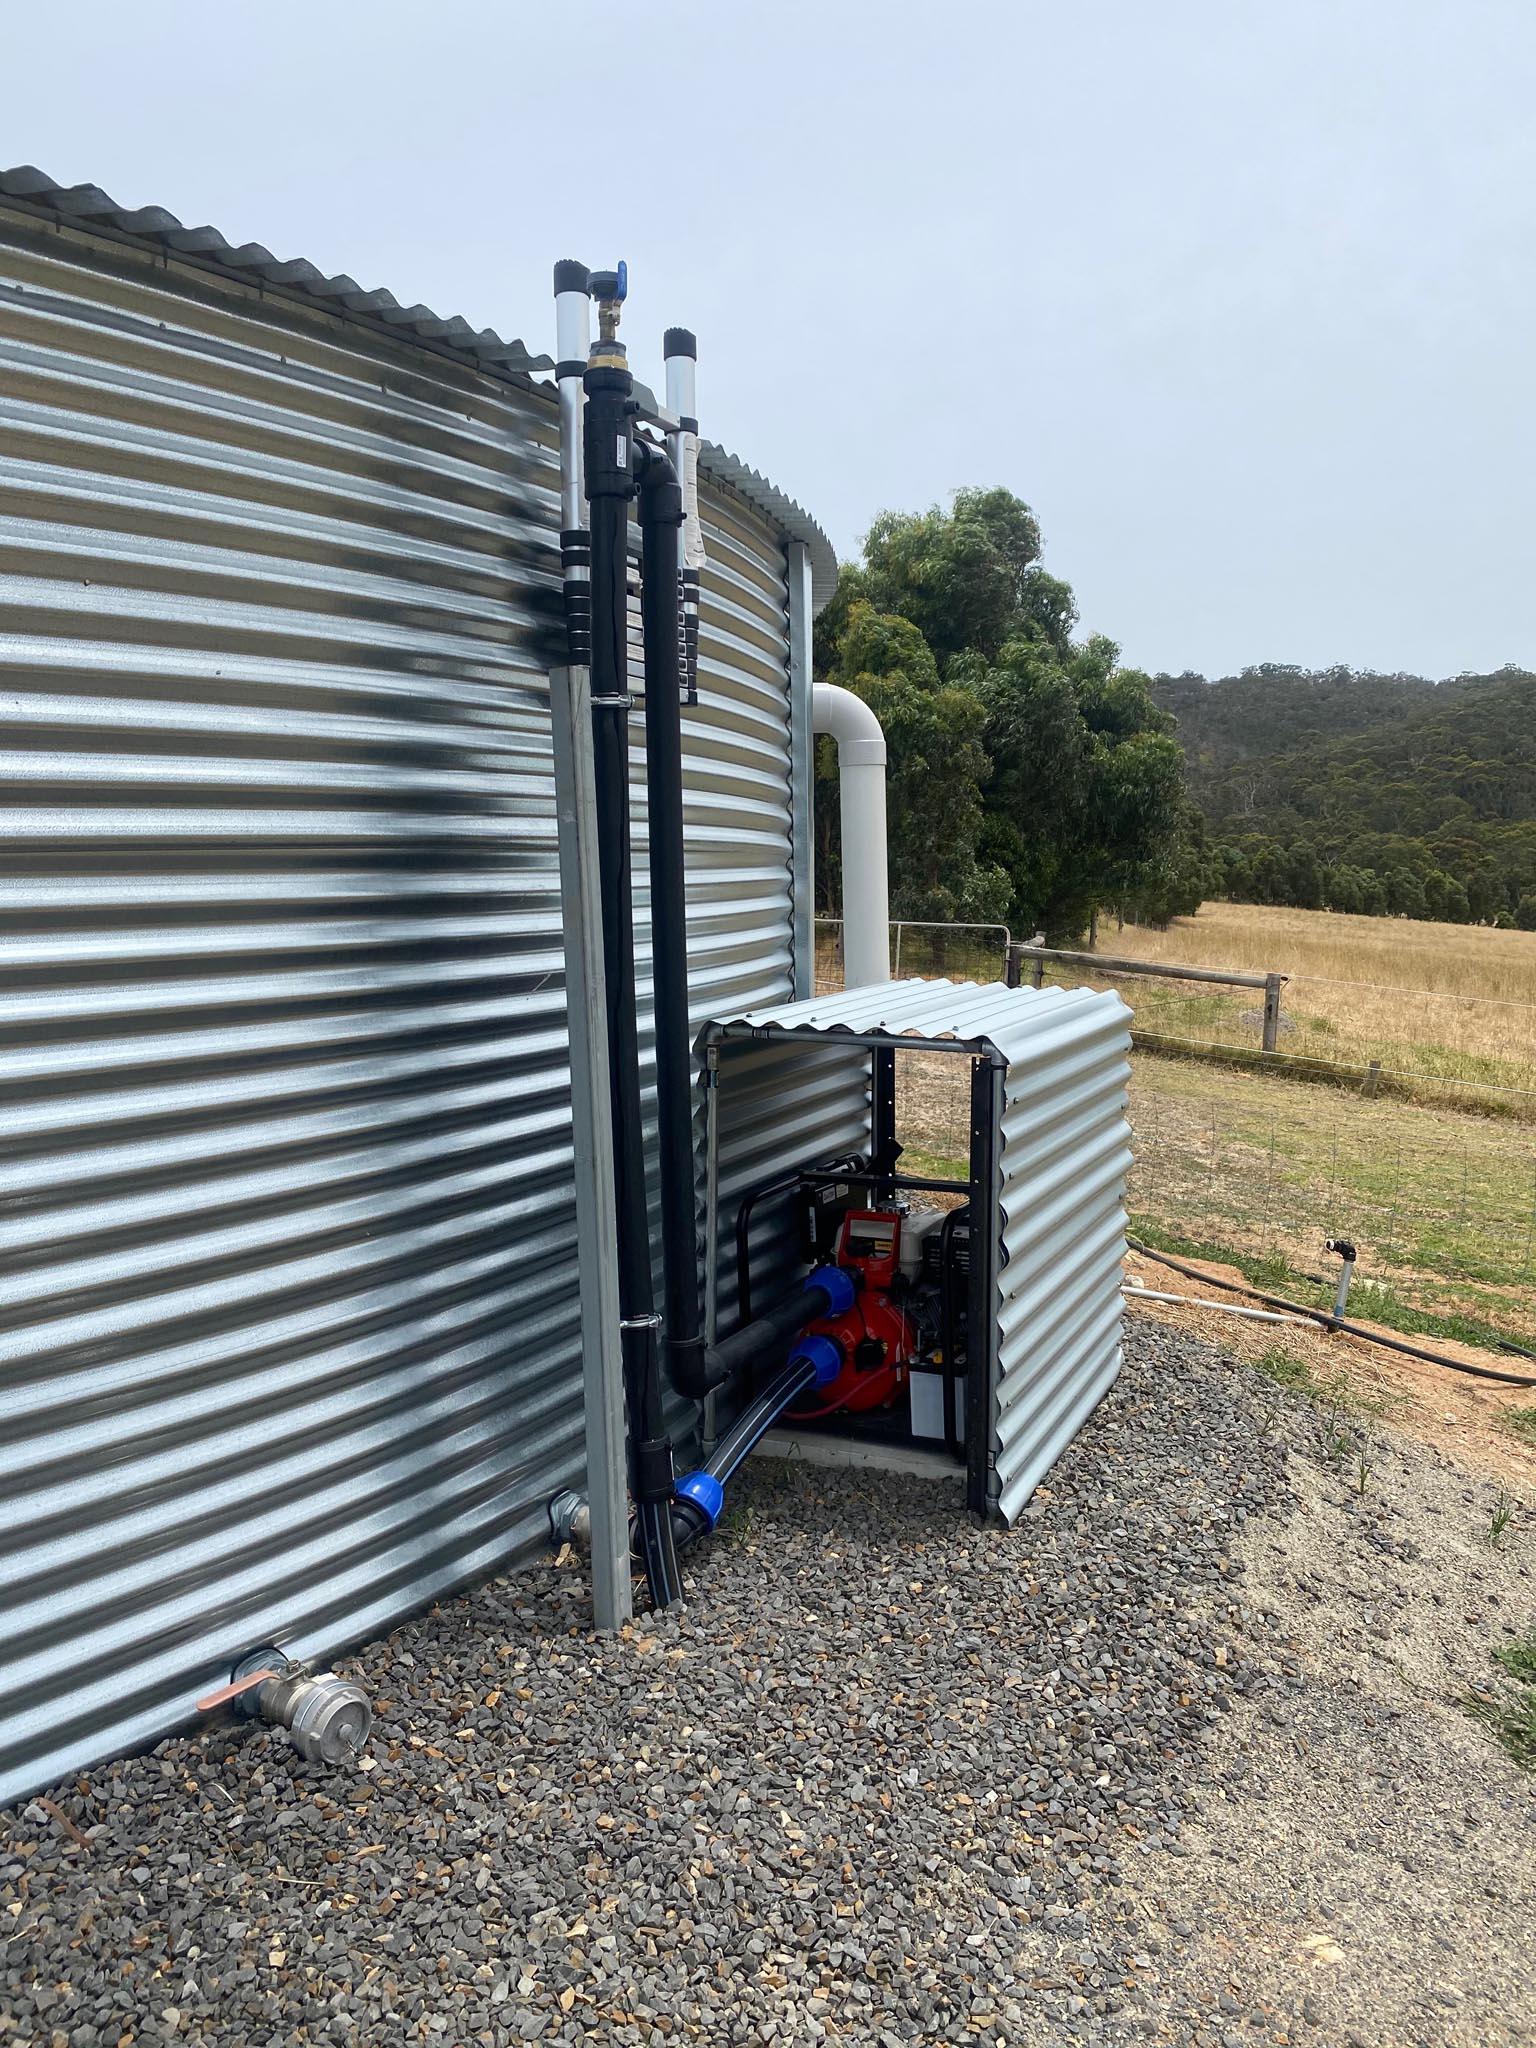 Bushfire Sprinkler System Plumber in Griffith NSW